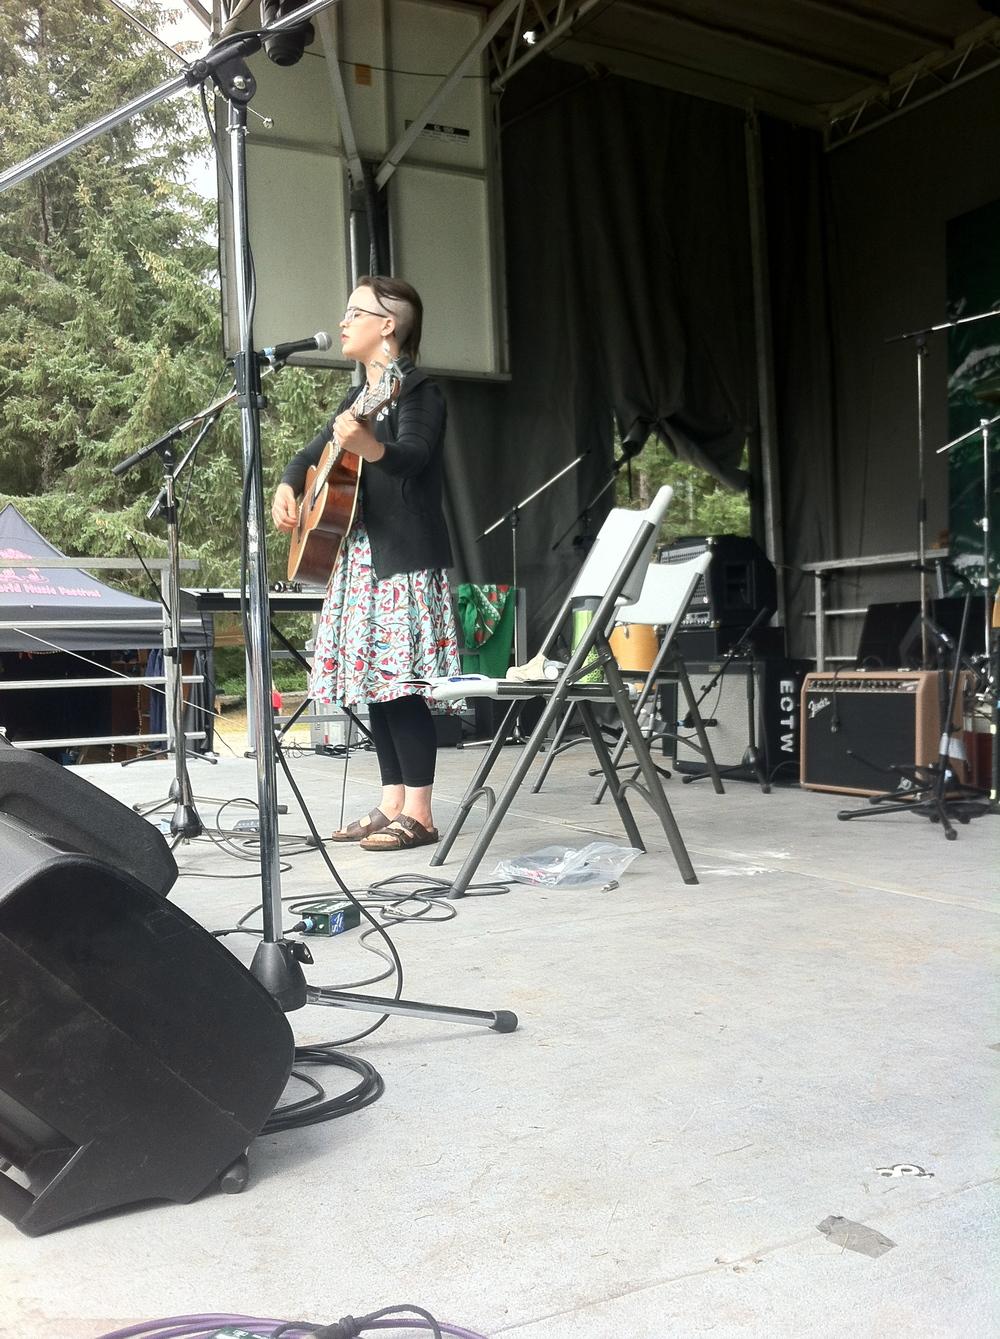 Edge of the World Festival, Mainstage  - Haida Gwaii, BC